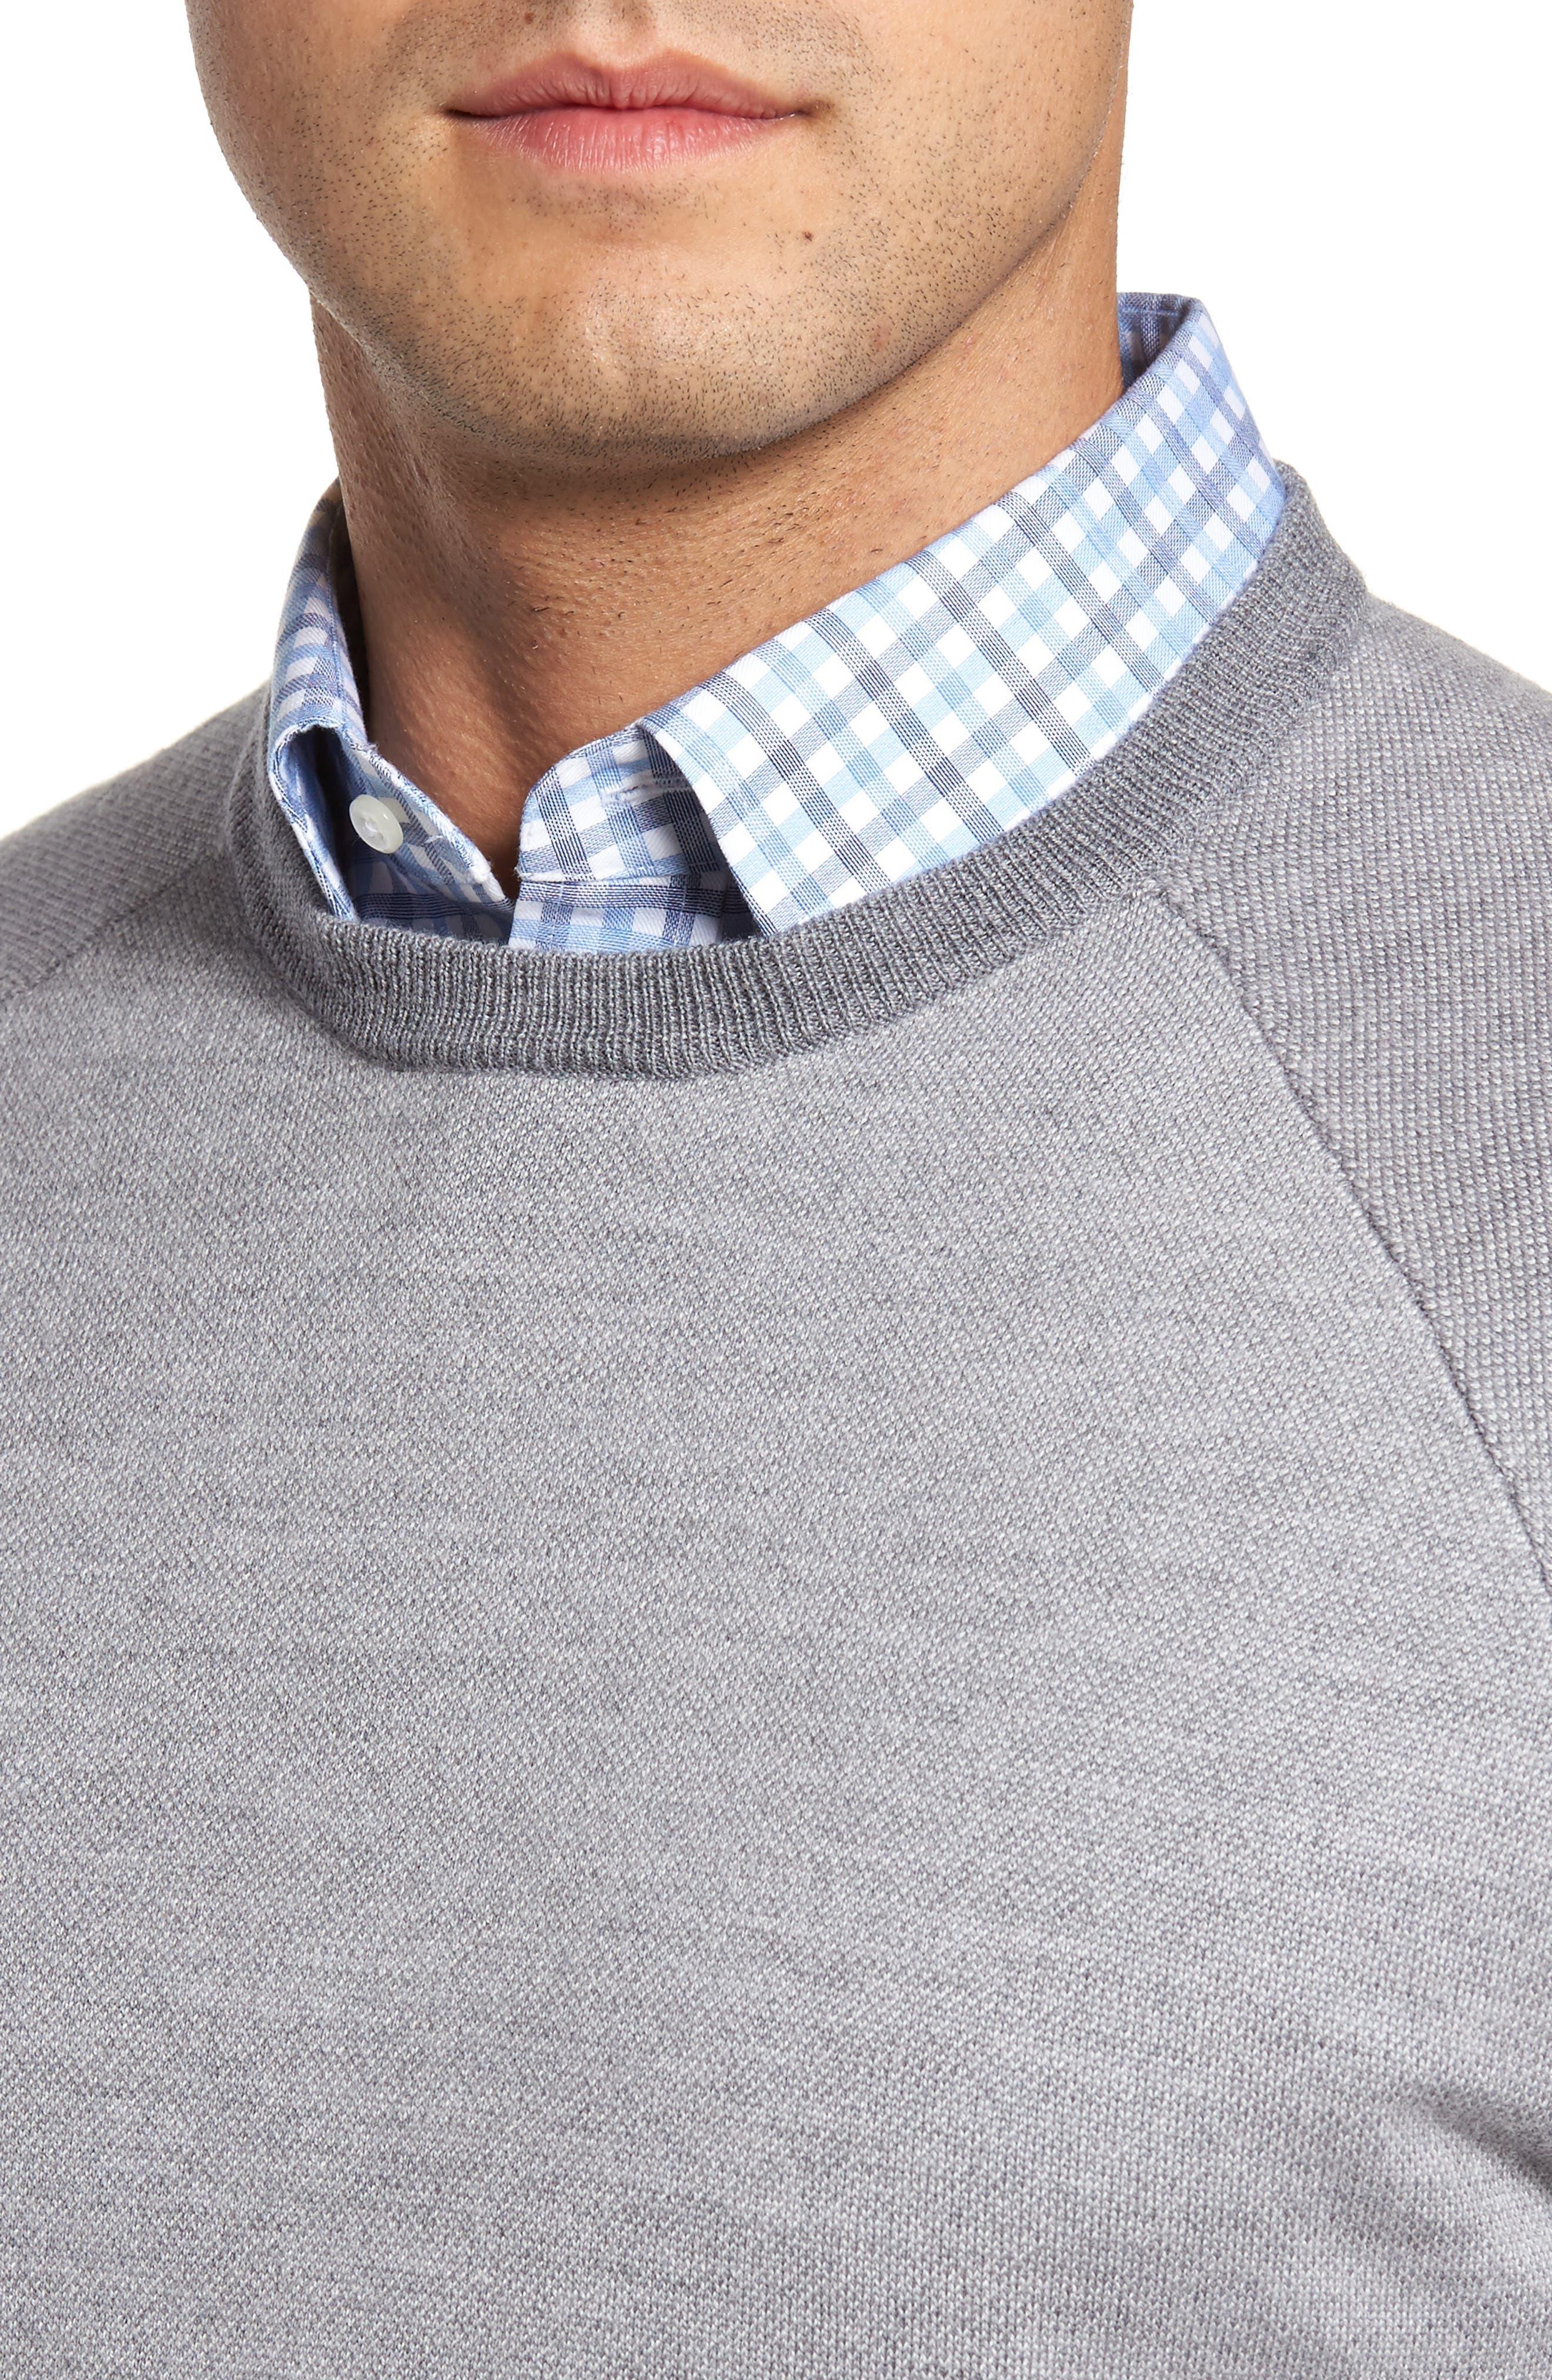 Soltice Merino Sweater,                             Alternate thumbnail 4, color,                             Stingray